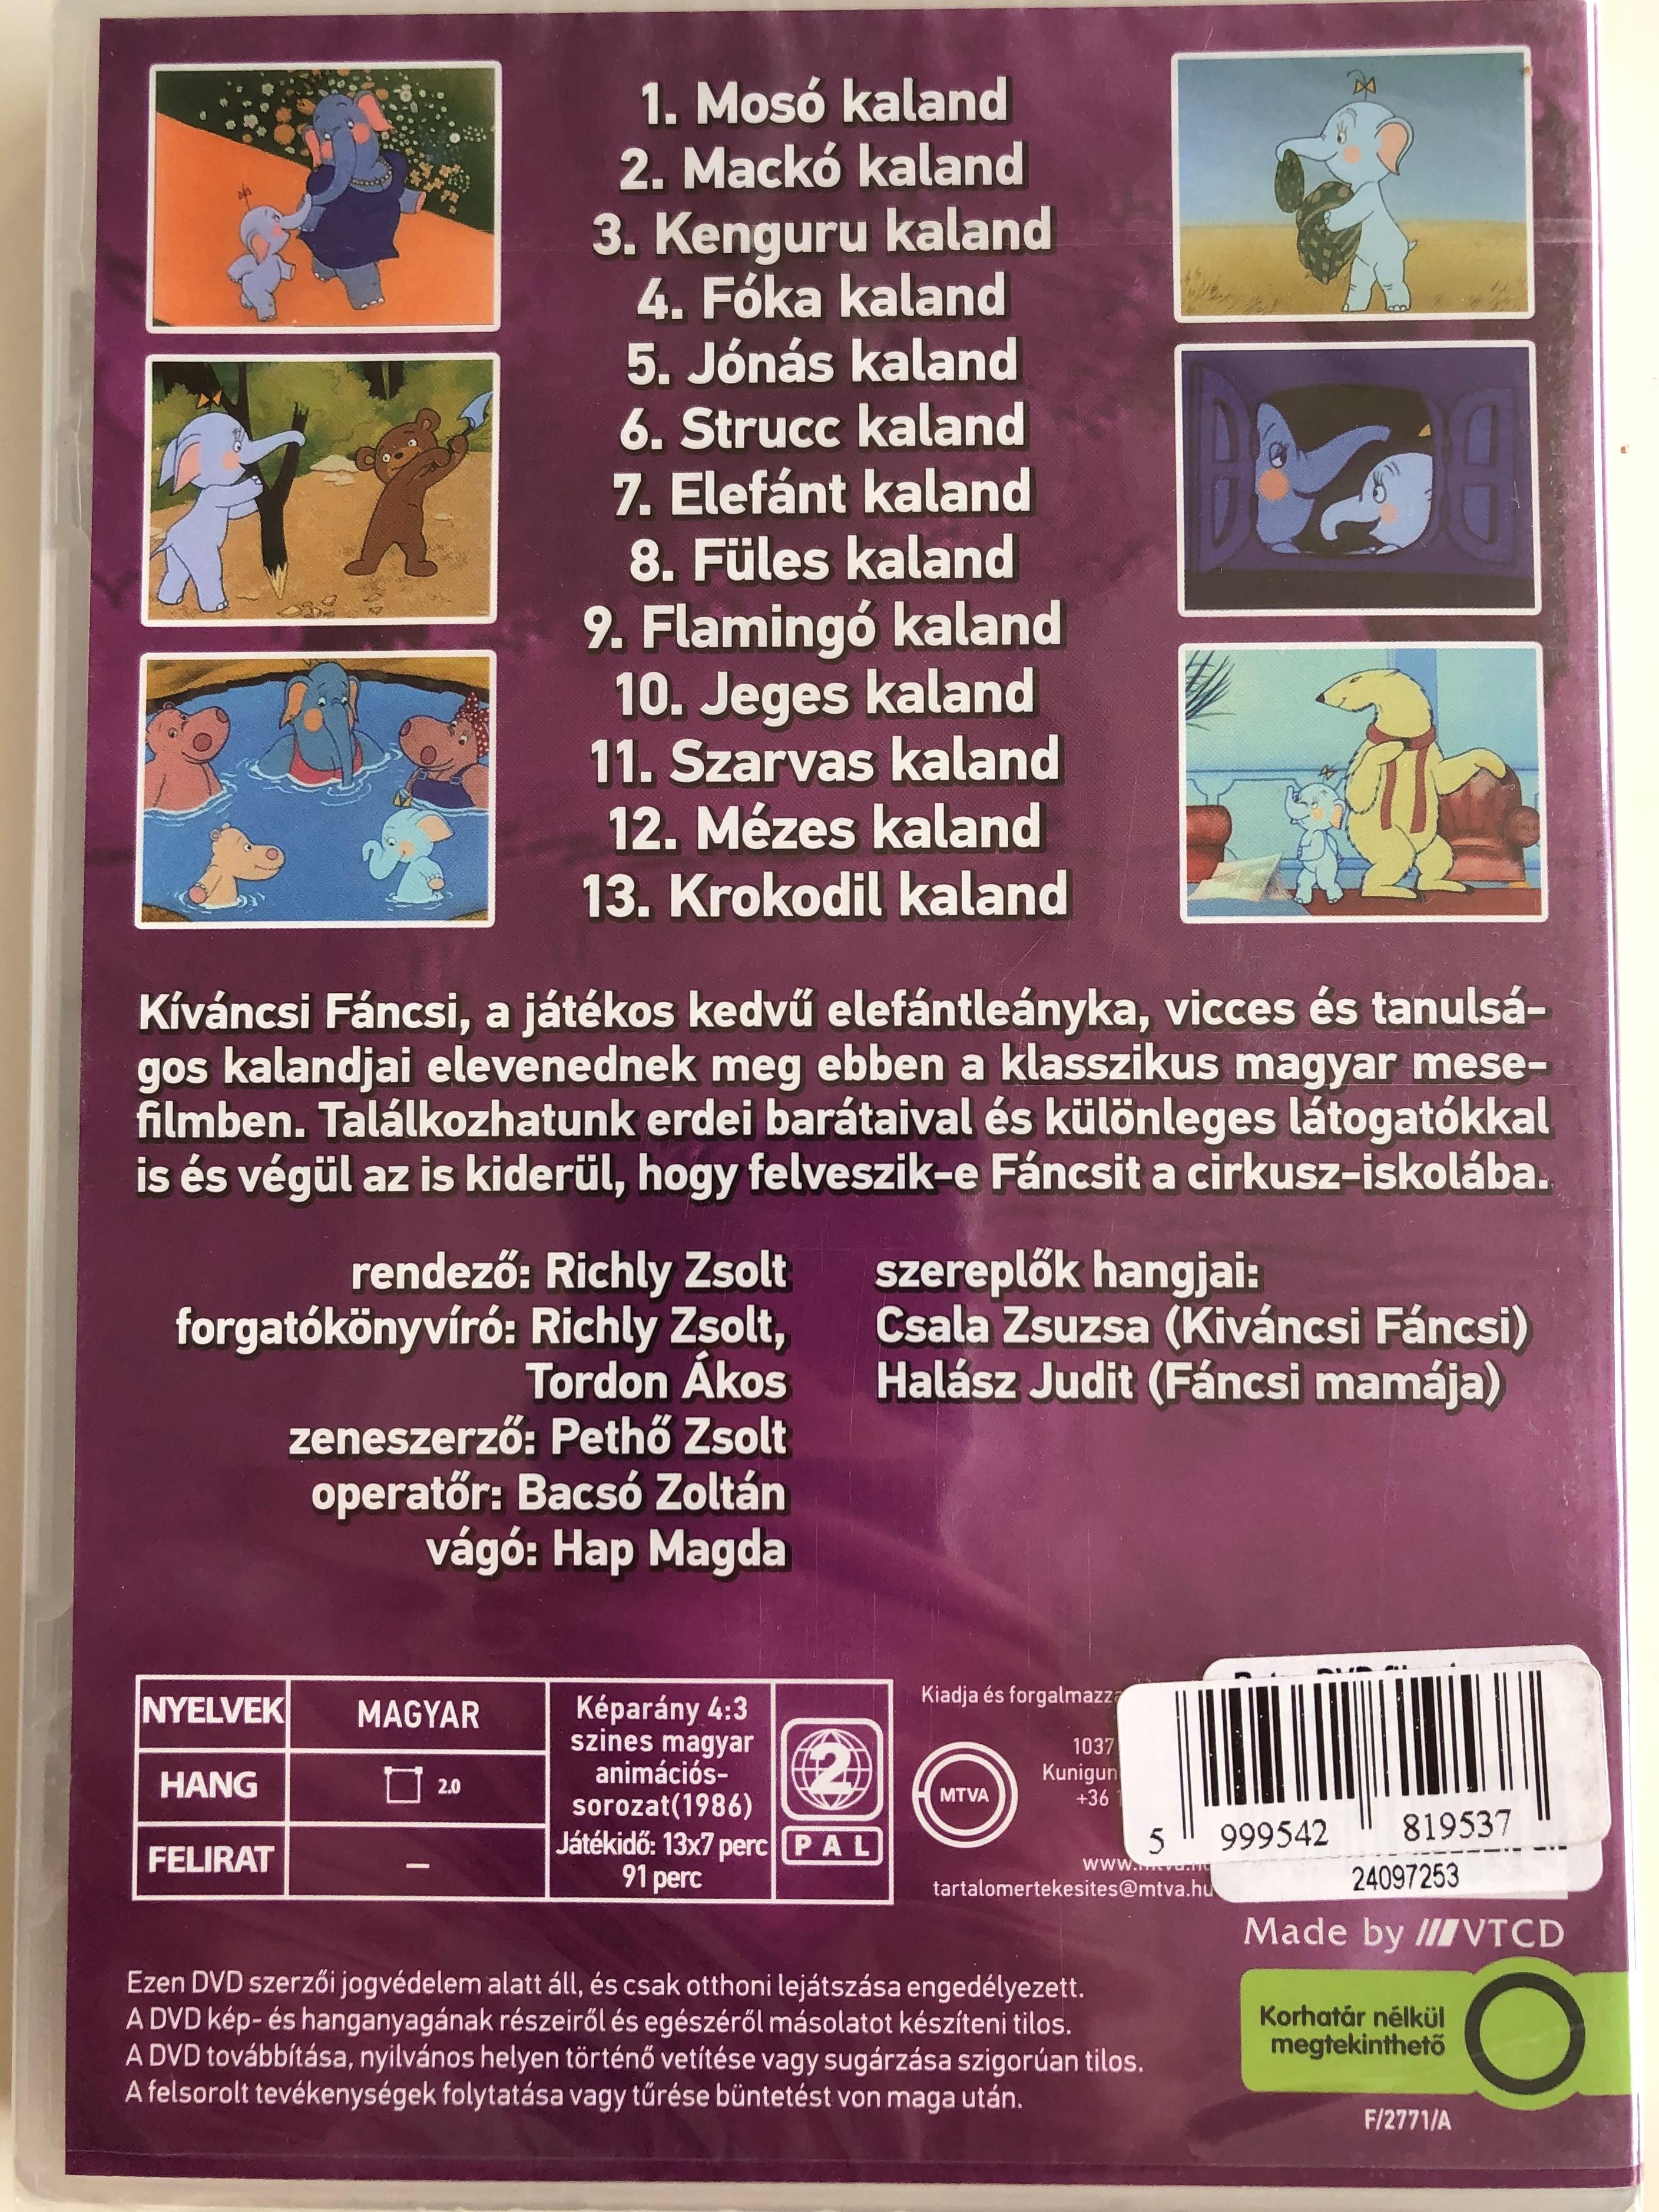 k-v-ncsi-f-ncsi-1989-dvd-hungarian-cartoon-series-directed-by-richly-zsolt-2.jpg